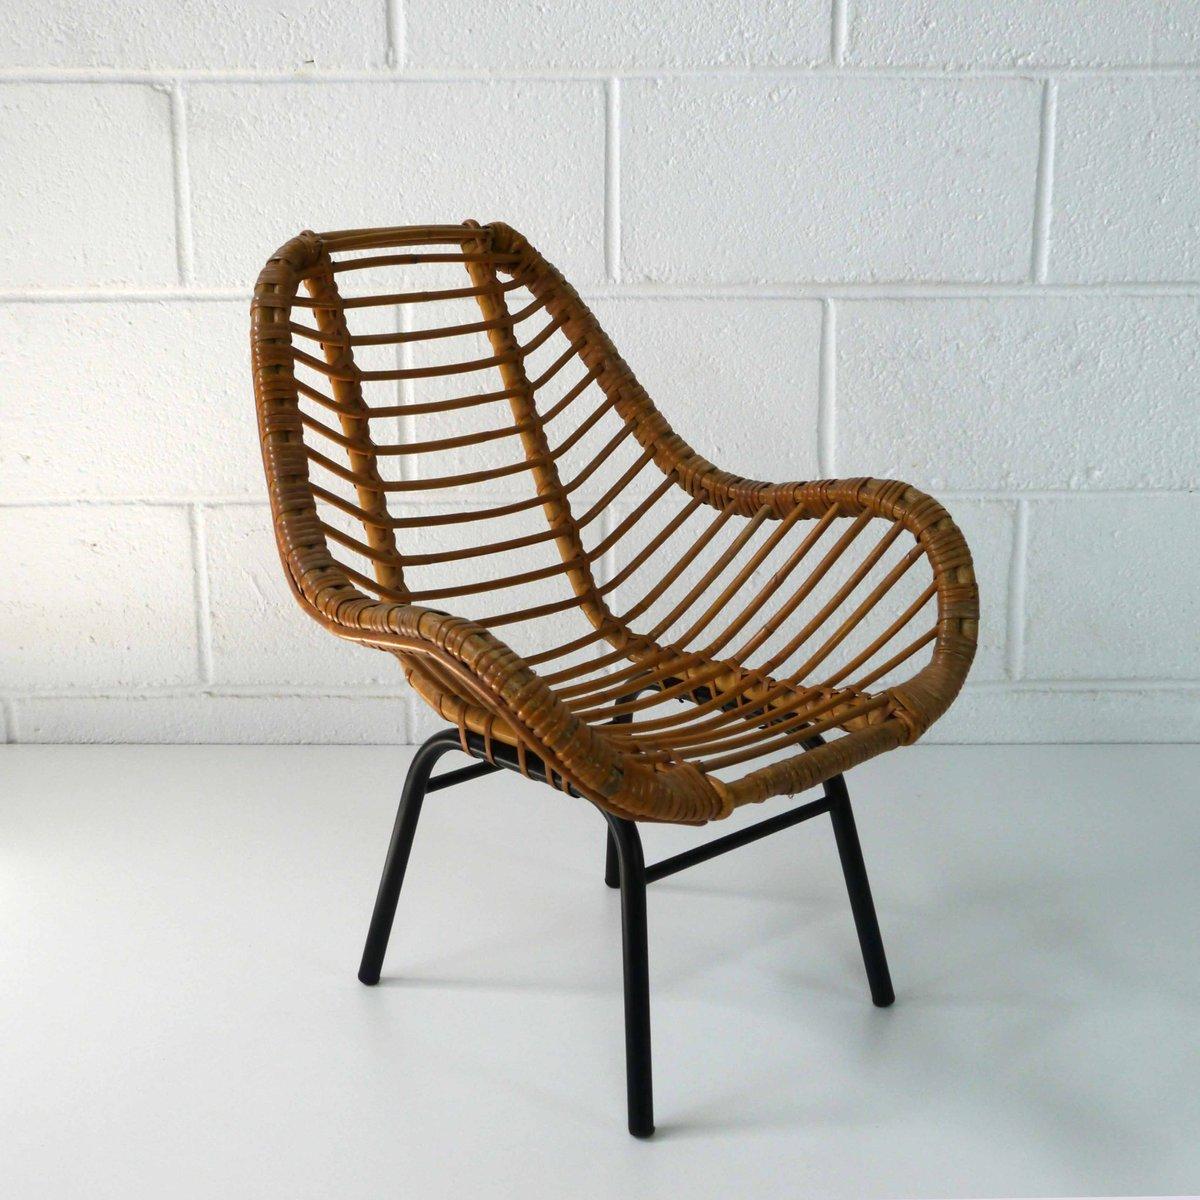 childs rattan chair sugar skull adirondack chairs children 39s 1960s for sale at pamono